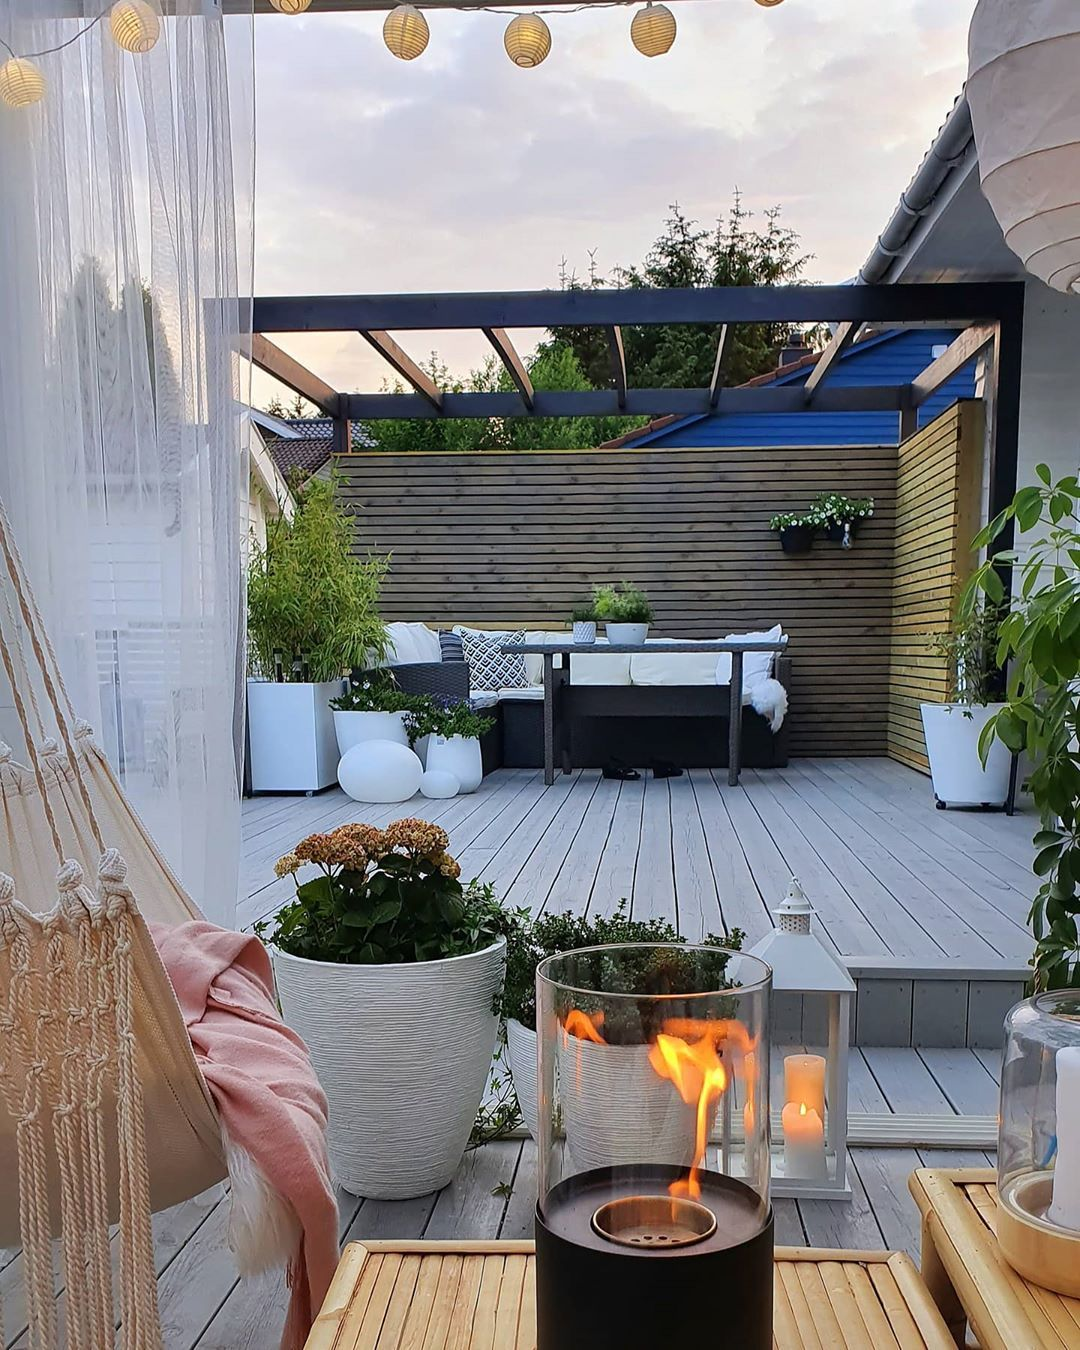 ~My view~ #minhage#hagestue#terrasseinspiration#terrasseliv#terrasse#trädgårdsinspiration#trädgård#pergola#gardeninspiration#gardenlife#garden#outdoors